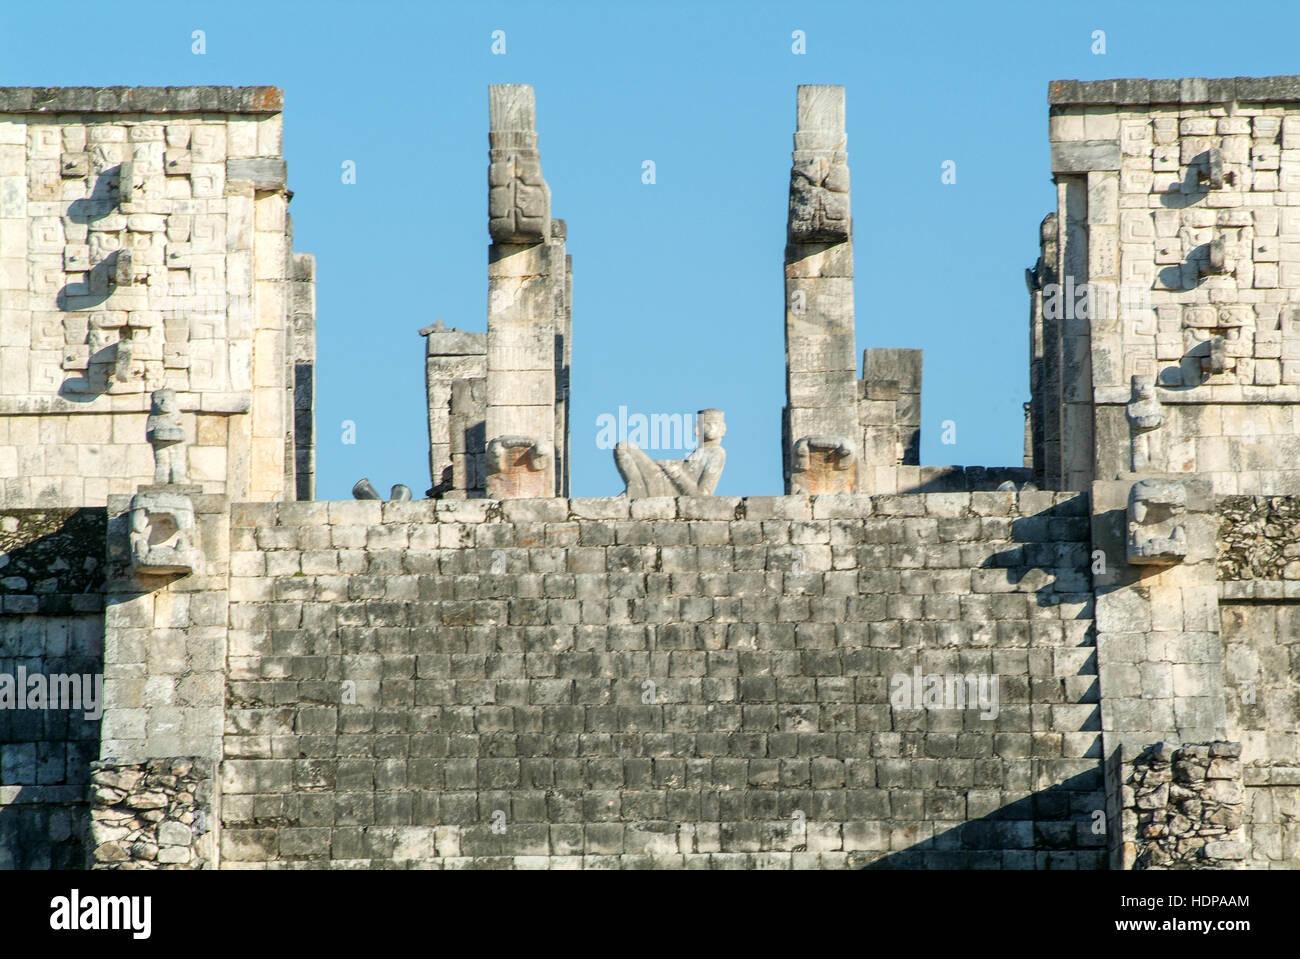 Templo de los Guerreros, Temple of the Warriors at Chichen Itza, Yucatan, Mexico Stock Photo